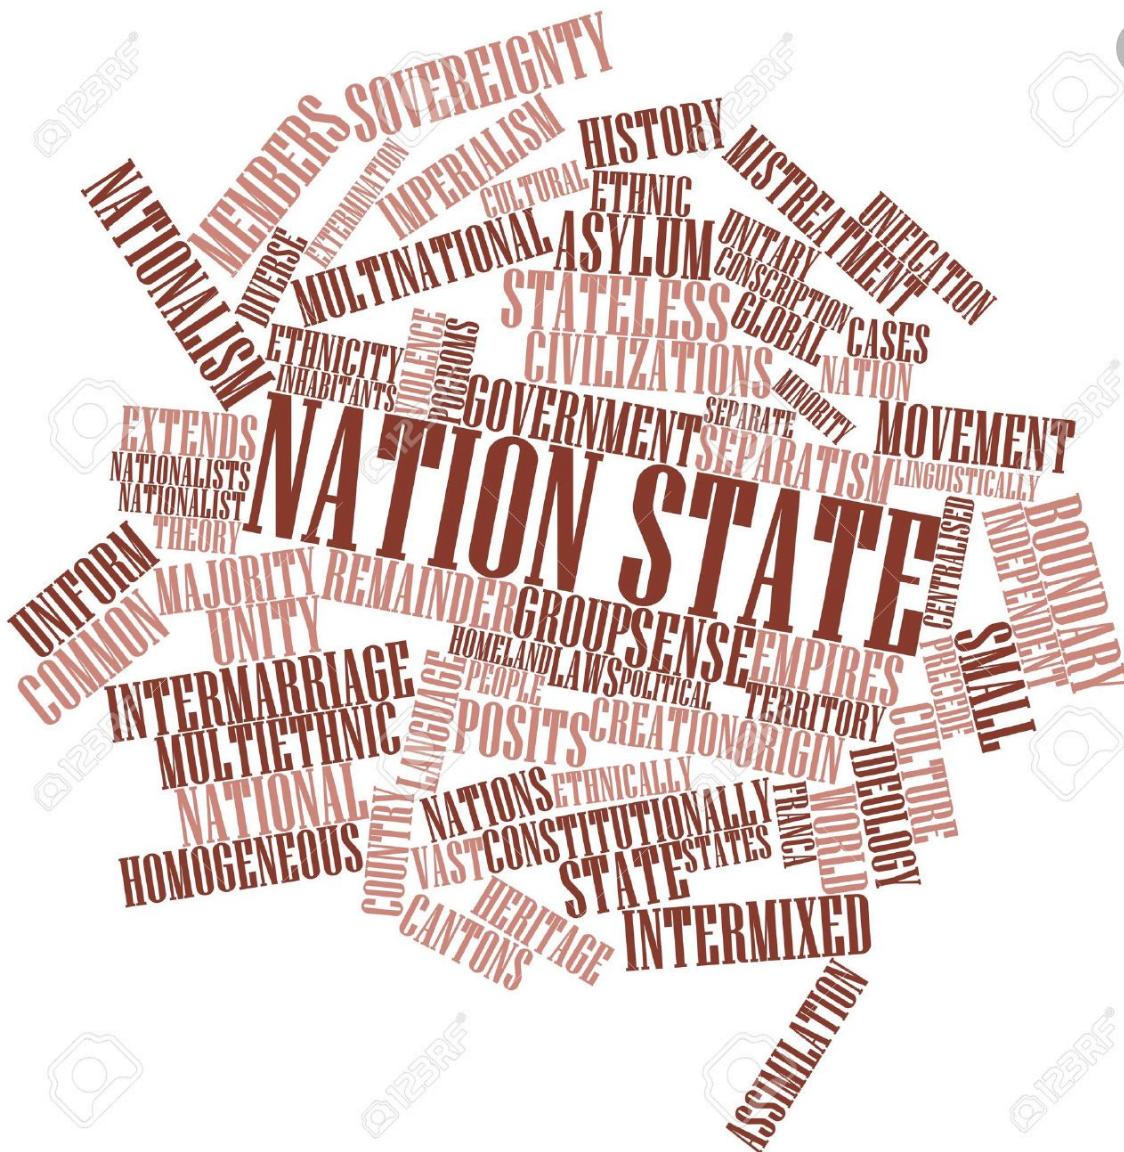 Etat, Nation